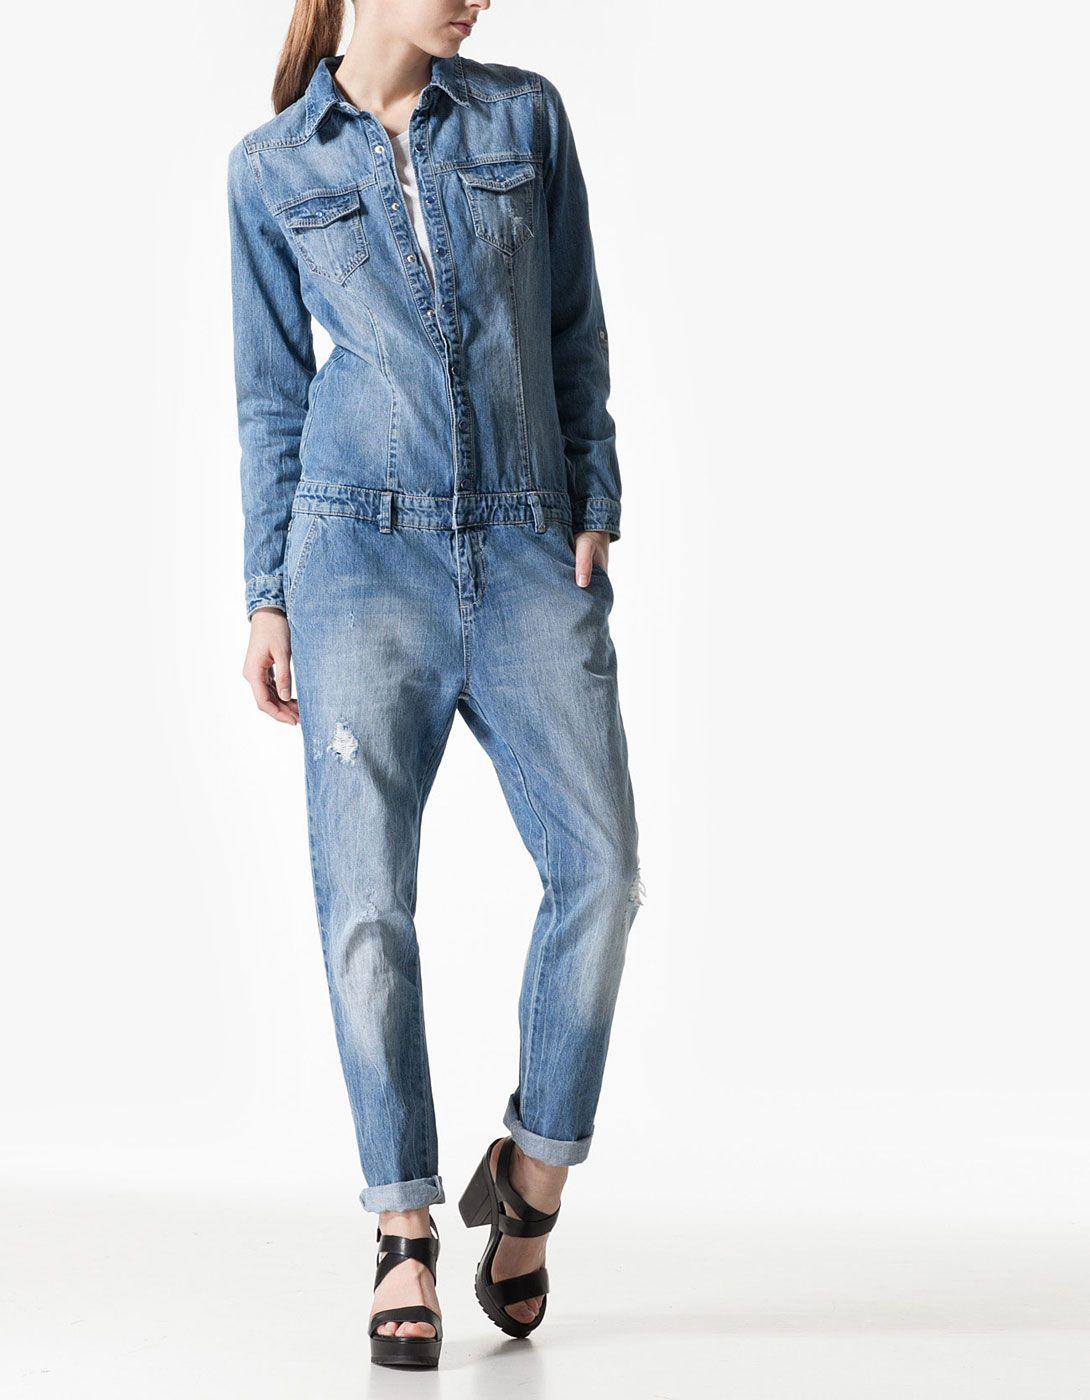 86c54d566a7 Τζιν ολόσωμη φόρμα | Things to Wear | Τζιν